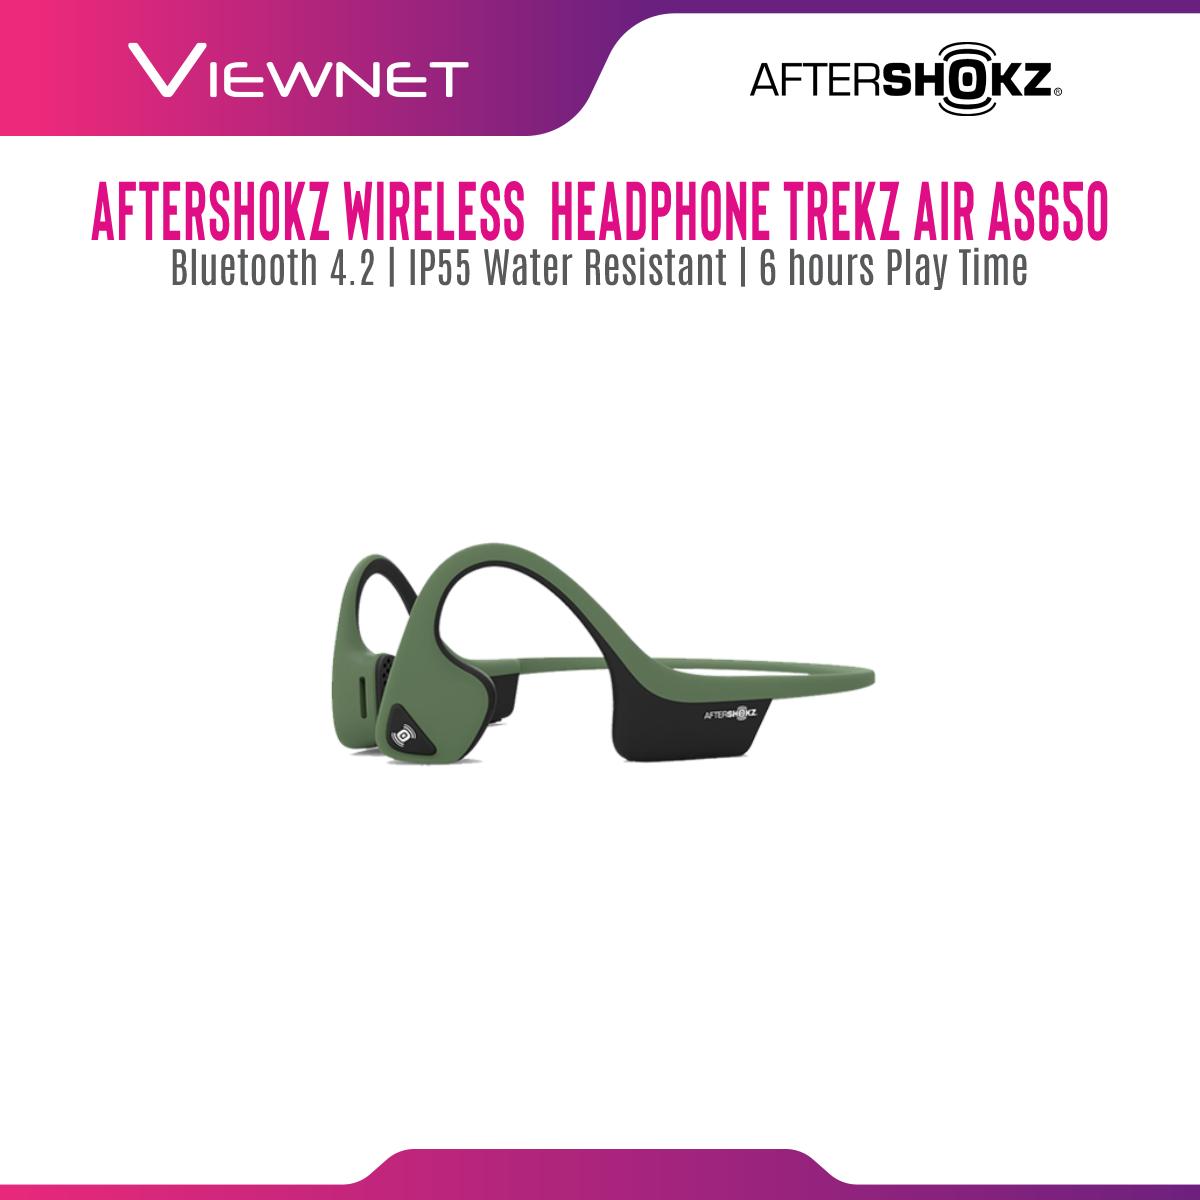 AfterShokz Trekz Air Slate Grey/Forest Green/Midnight Blue/Canyon Red Wireless Headphone